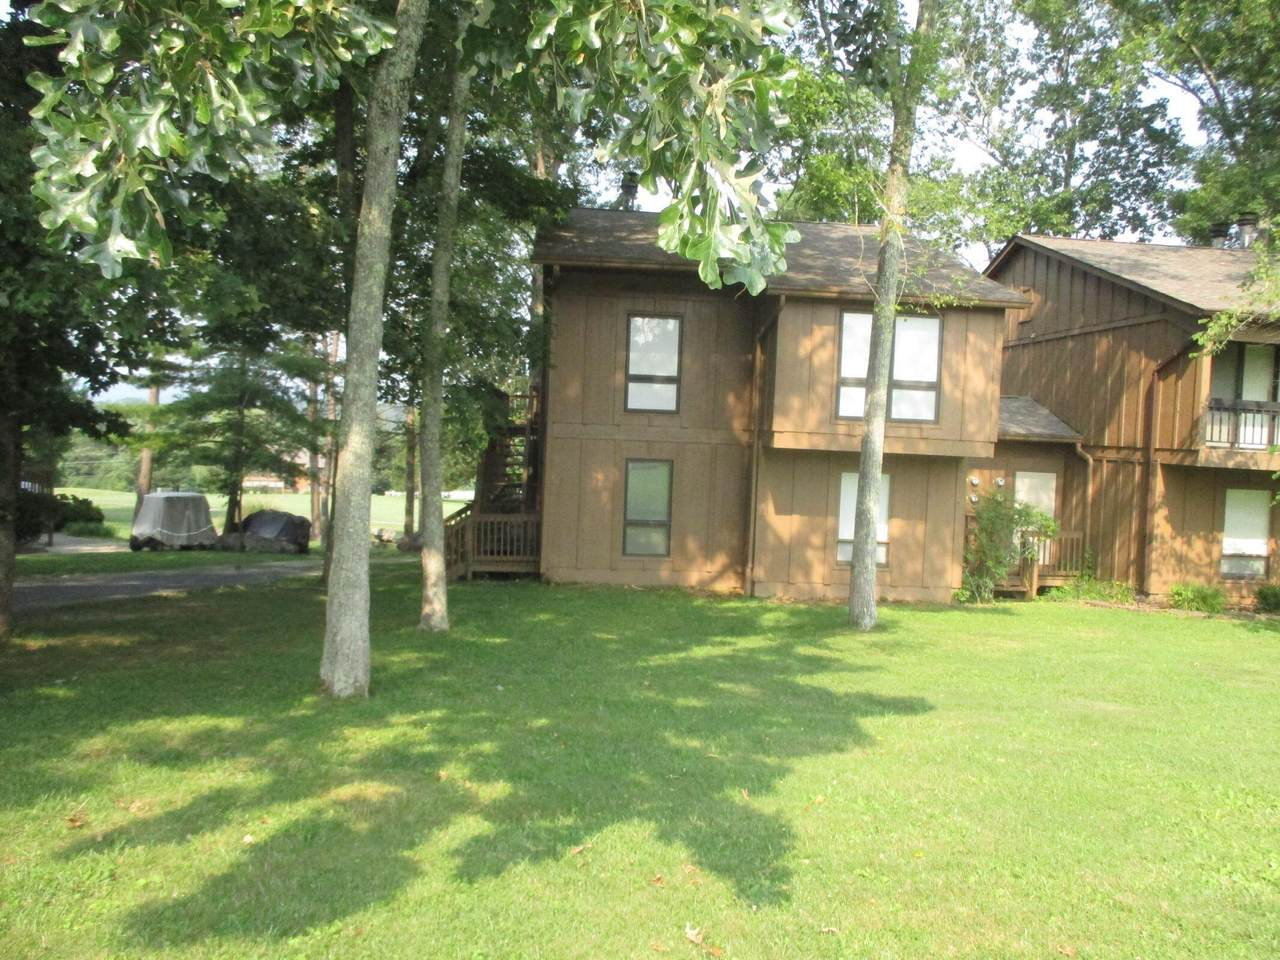 22-2 Woodson Bend Resort - Photo 1